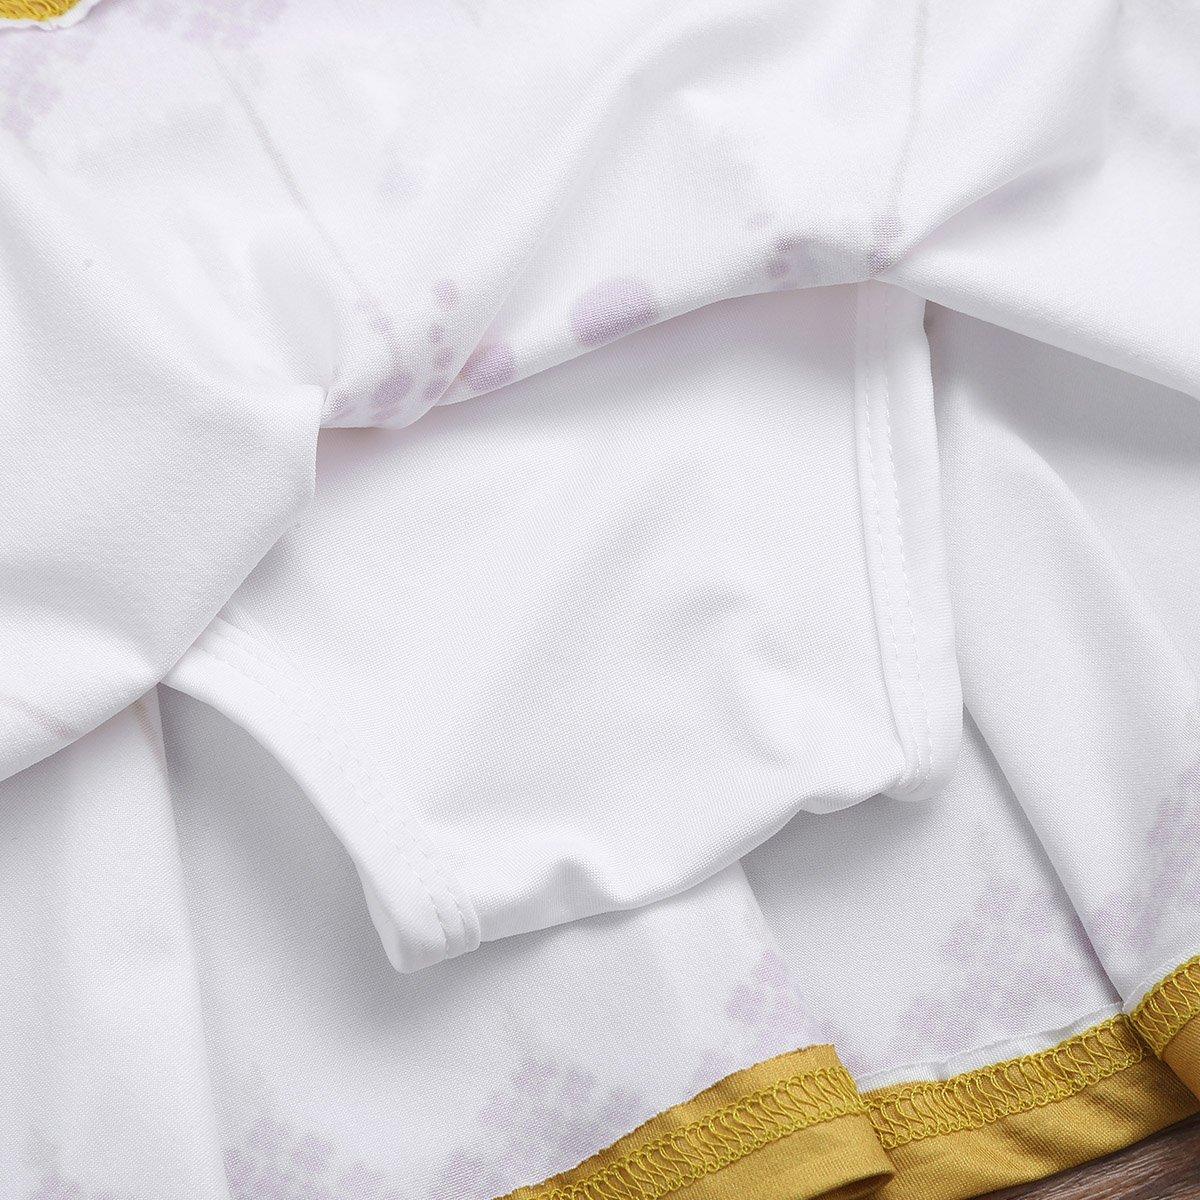 dPois Kids Girls One-Piece Camisole Swimming Dress Summer Beach Swimsuit Swimwear Bathing Suit